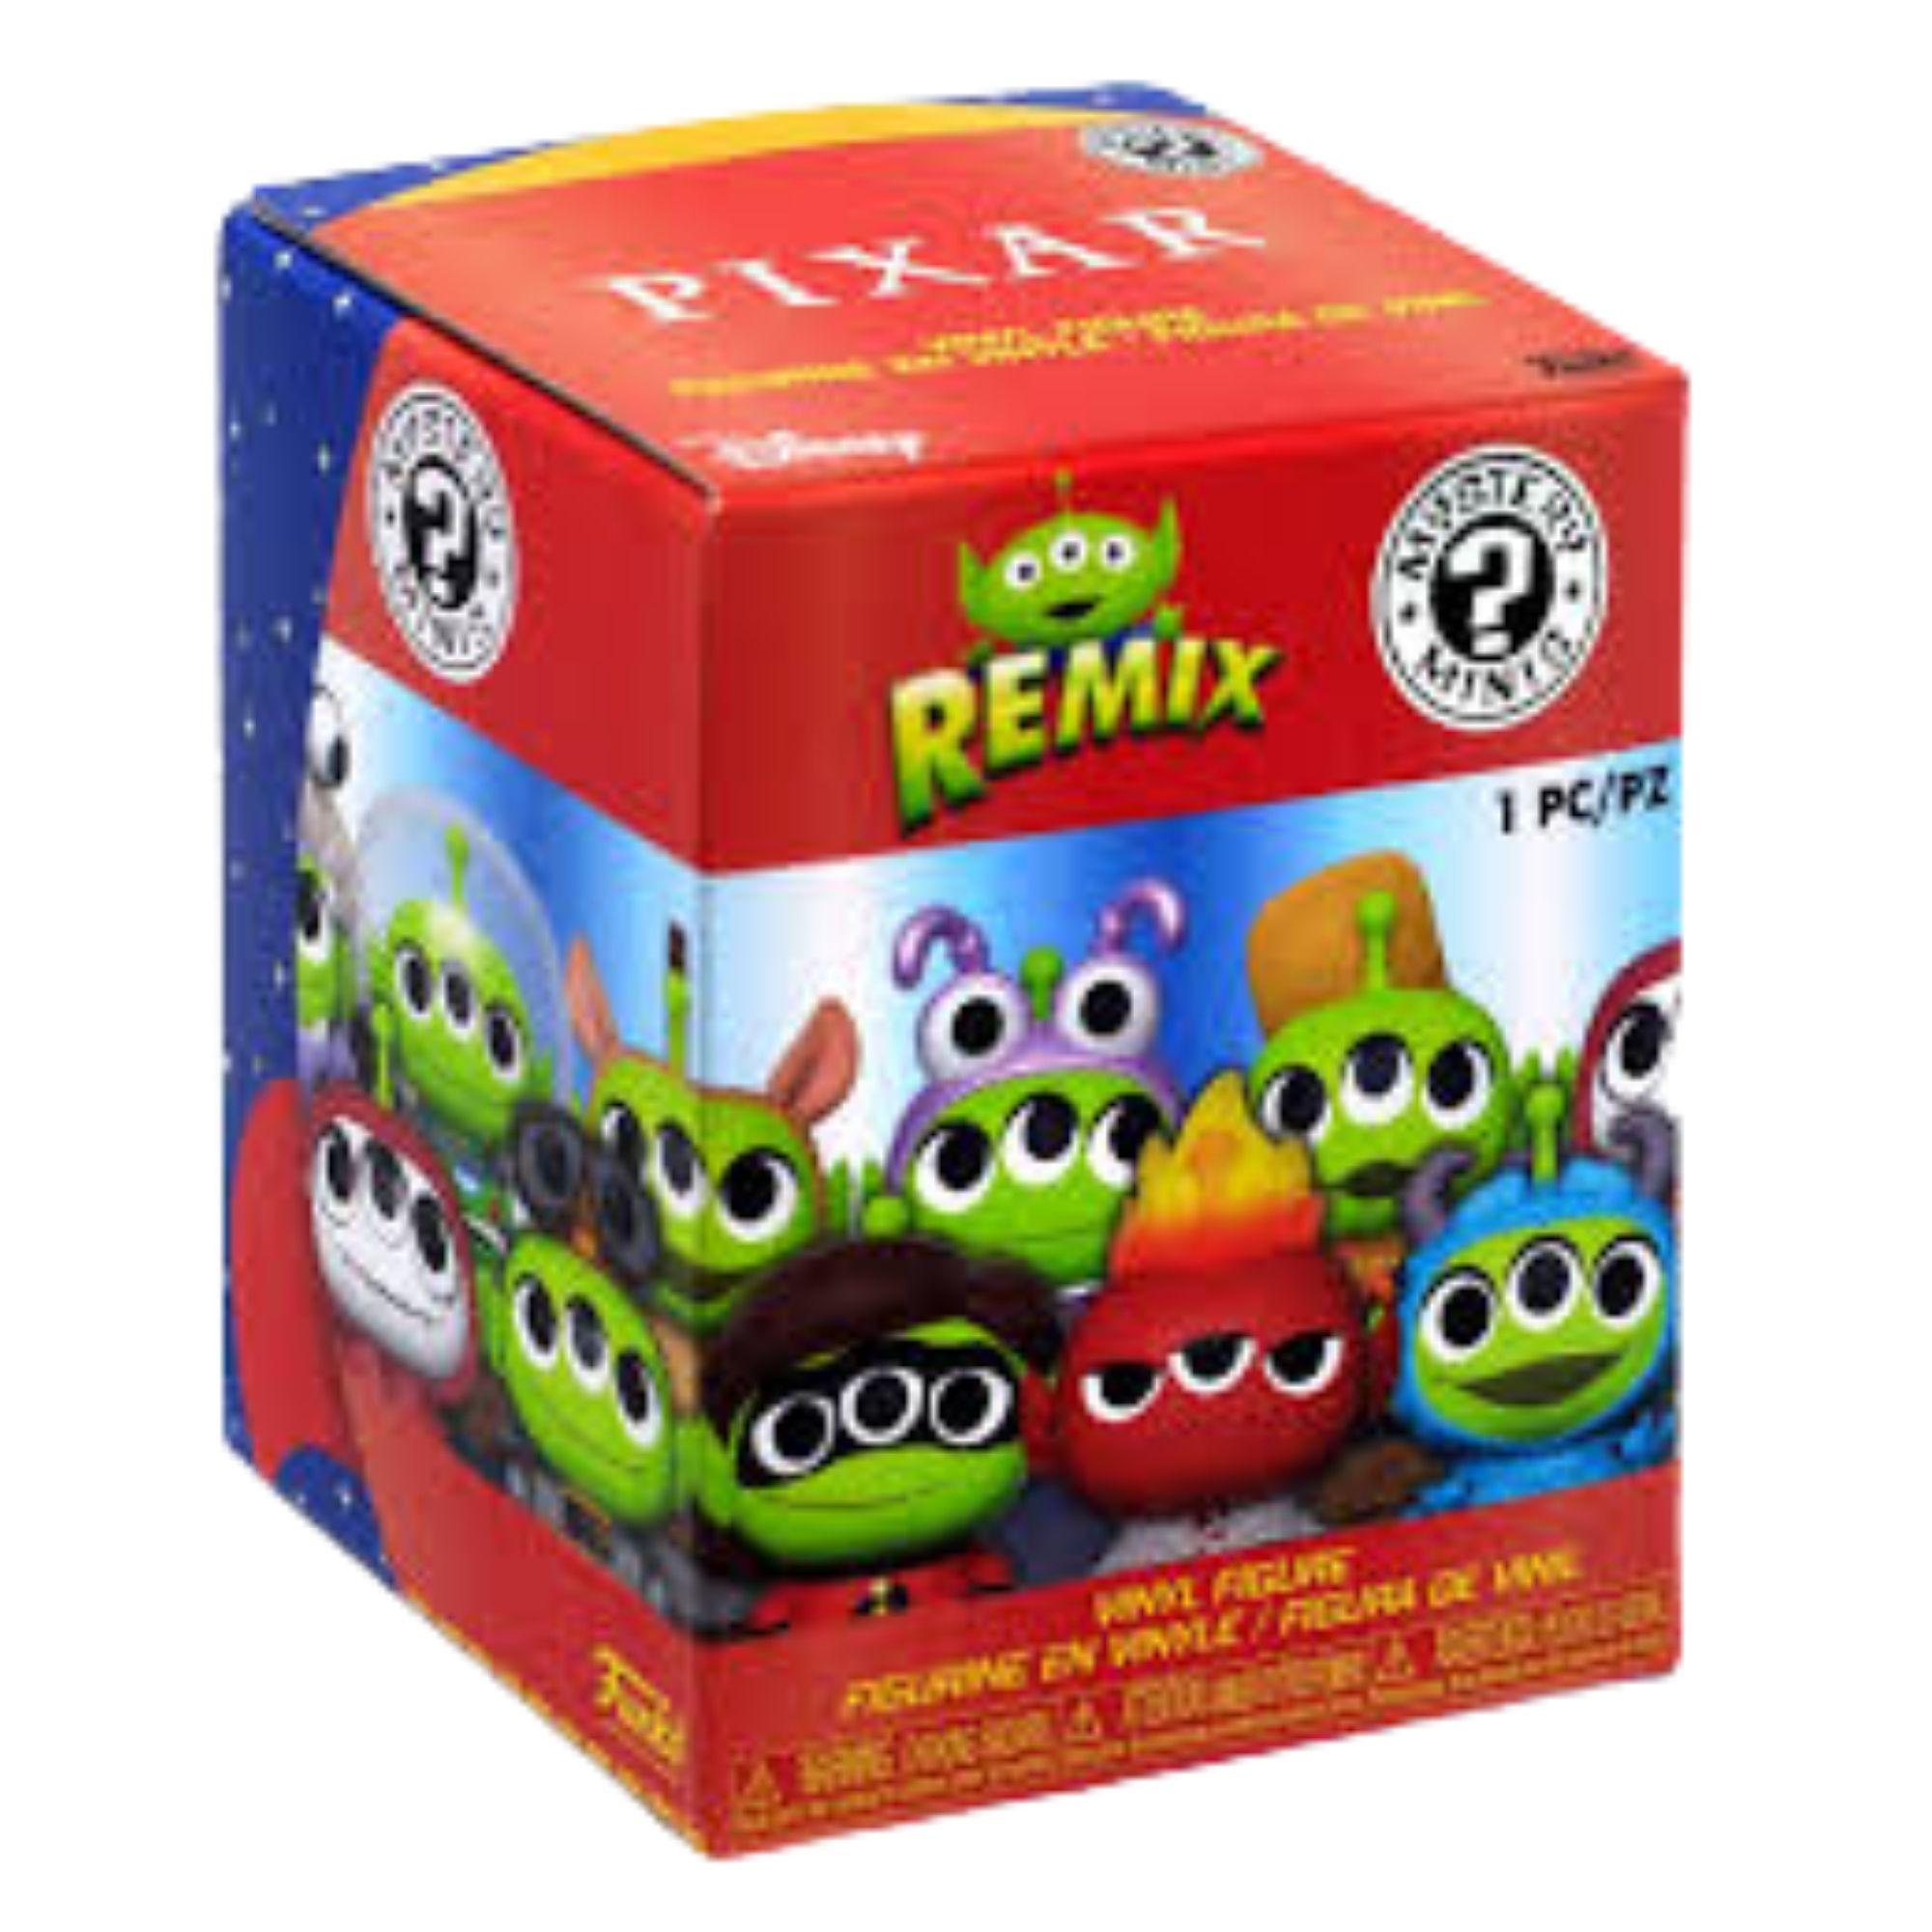 Funko Mini Mystery Remix Alien Pixar Boo Monstros  - Game Land Brinquedos